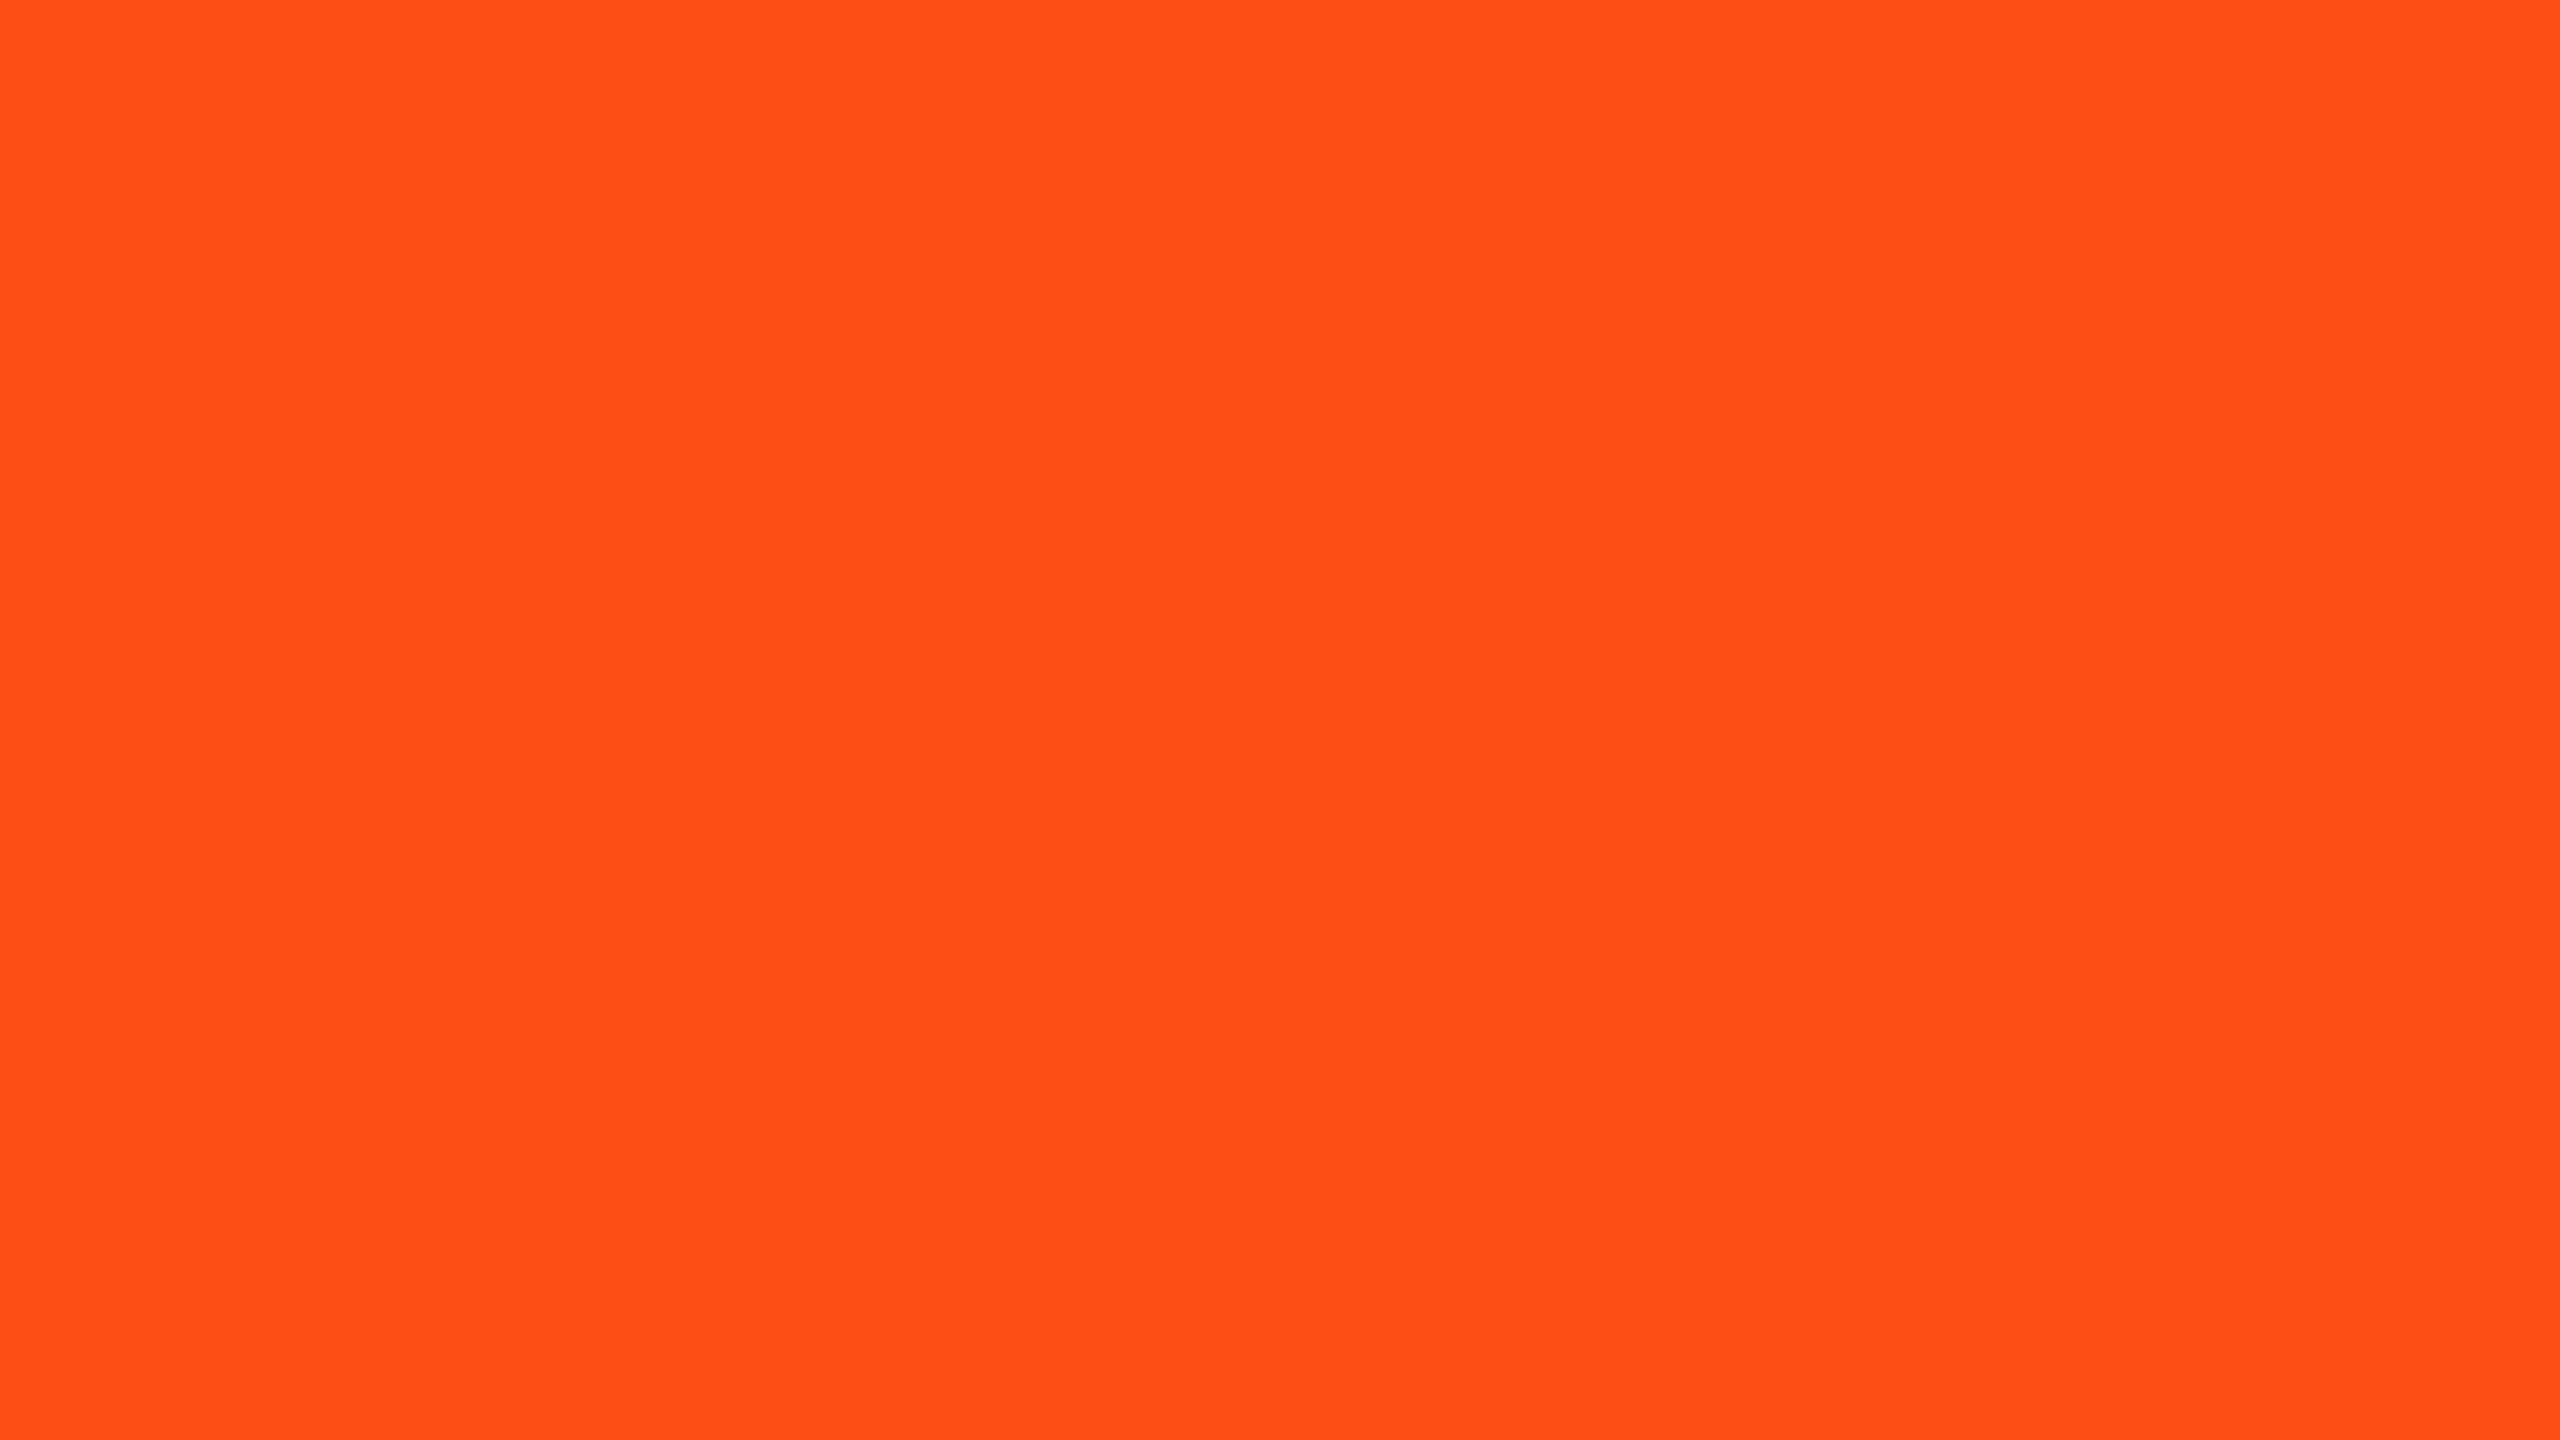 2560x1440 Orioles Orange Solid Color Background